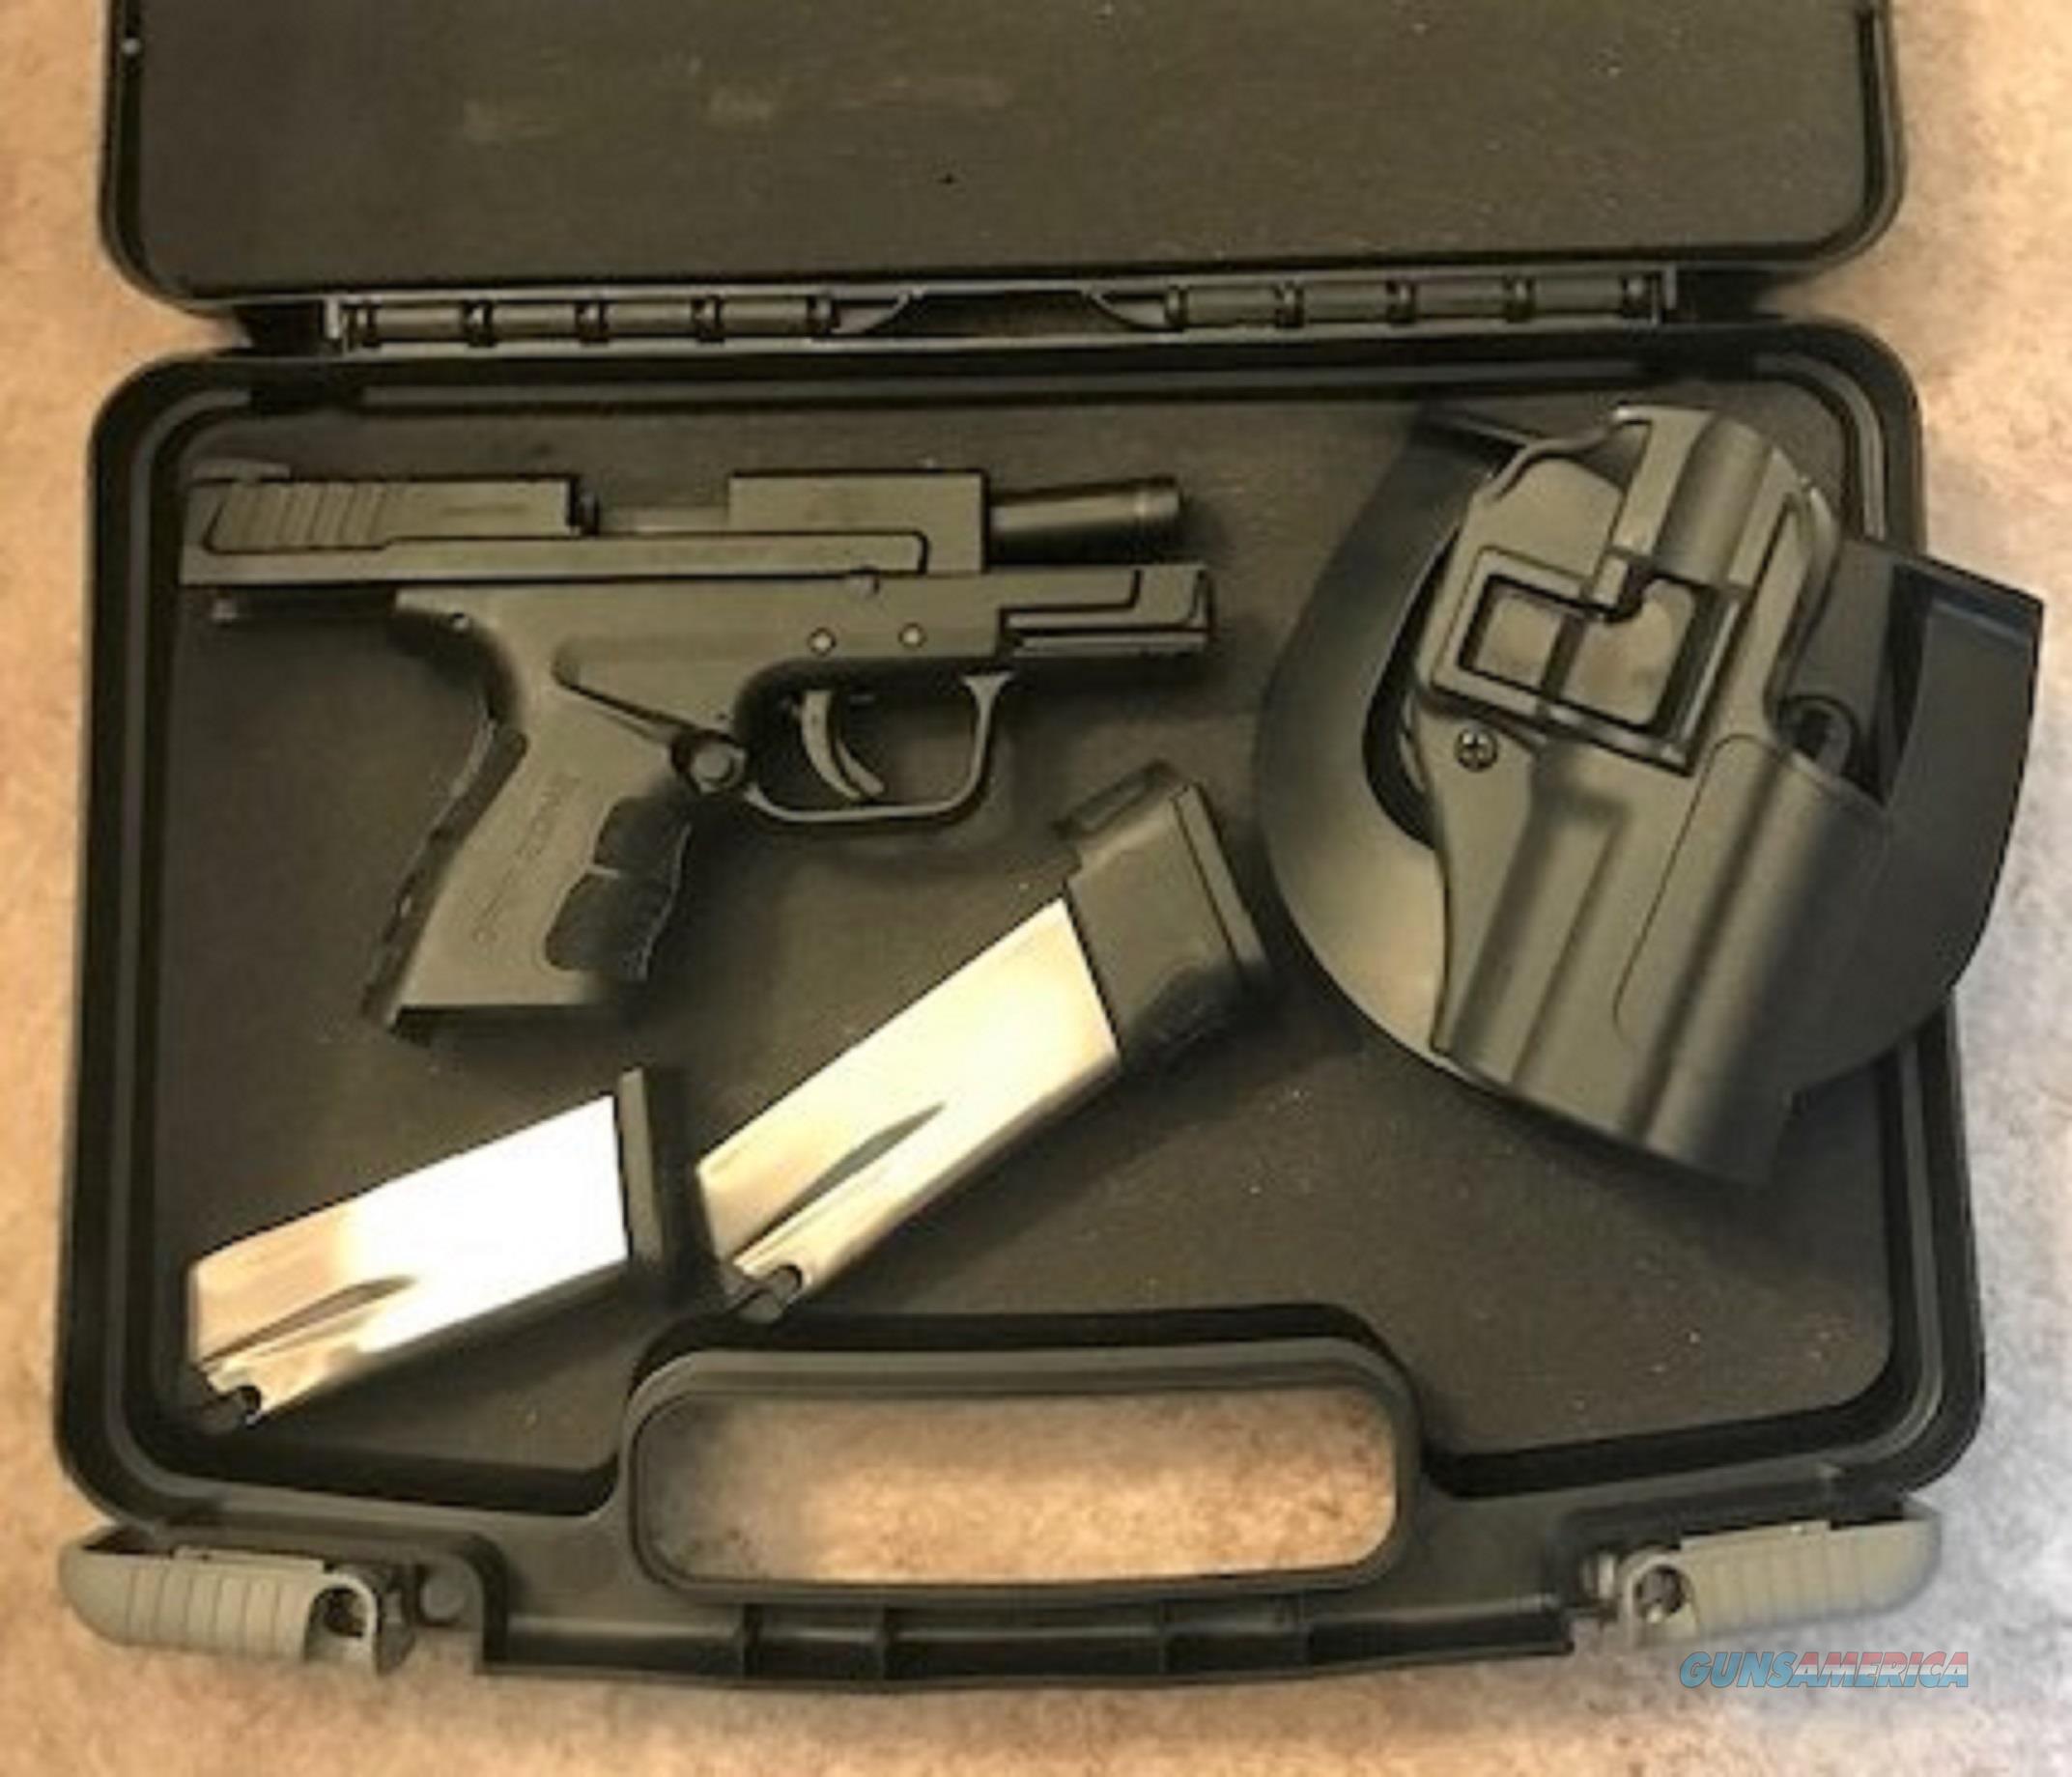 SPRINGFIELD  XD MOD 2 3.3 .45 ACP - 2 MAGS + HOLSTER  Guns > Pistols > Springfield Armory Pistols > XD-Mod.2